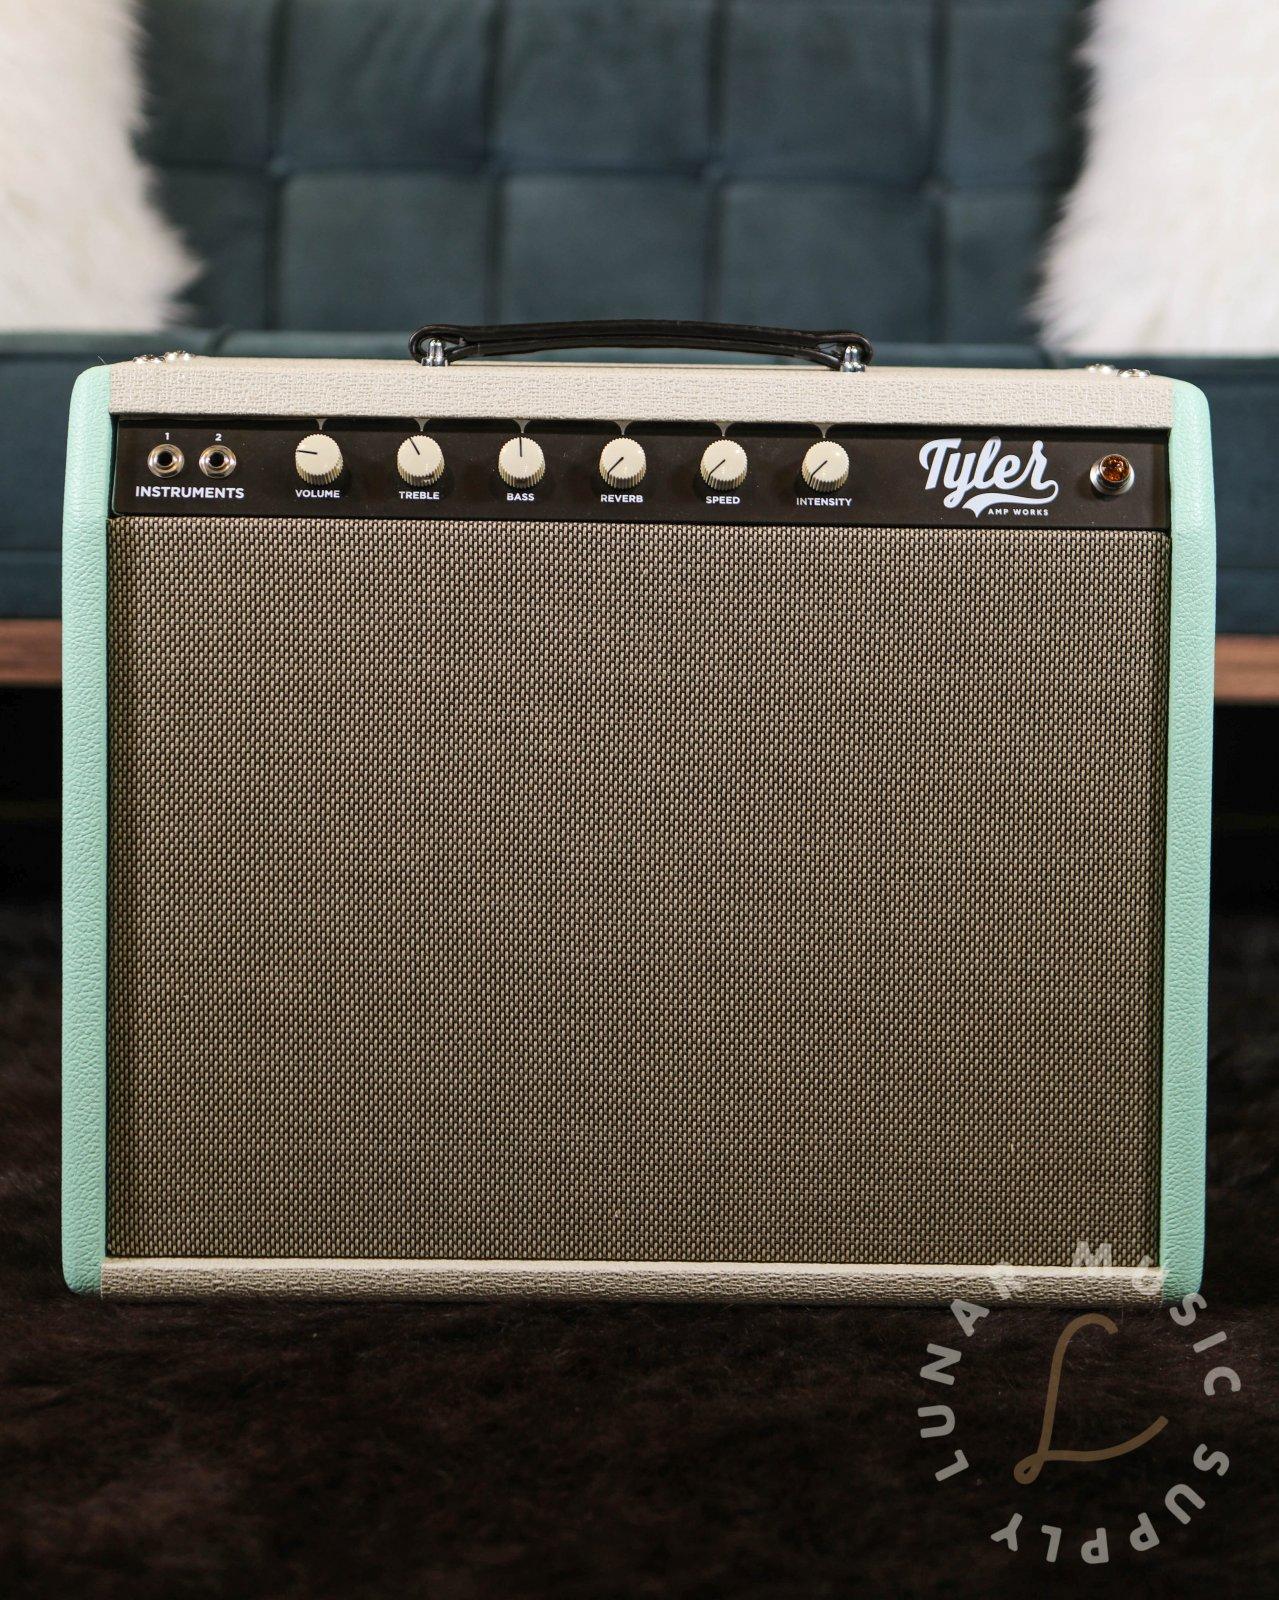 Tyler Amps JT-14 1x12 Combo Guitar Amplifier - Teal & Cream